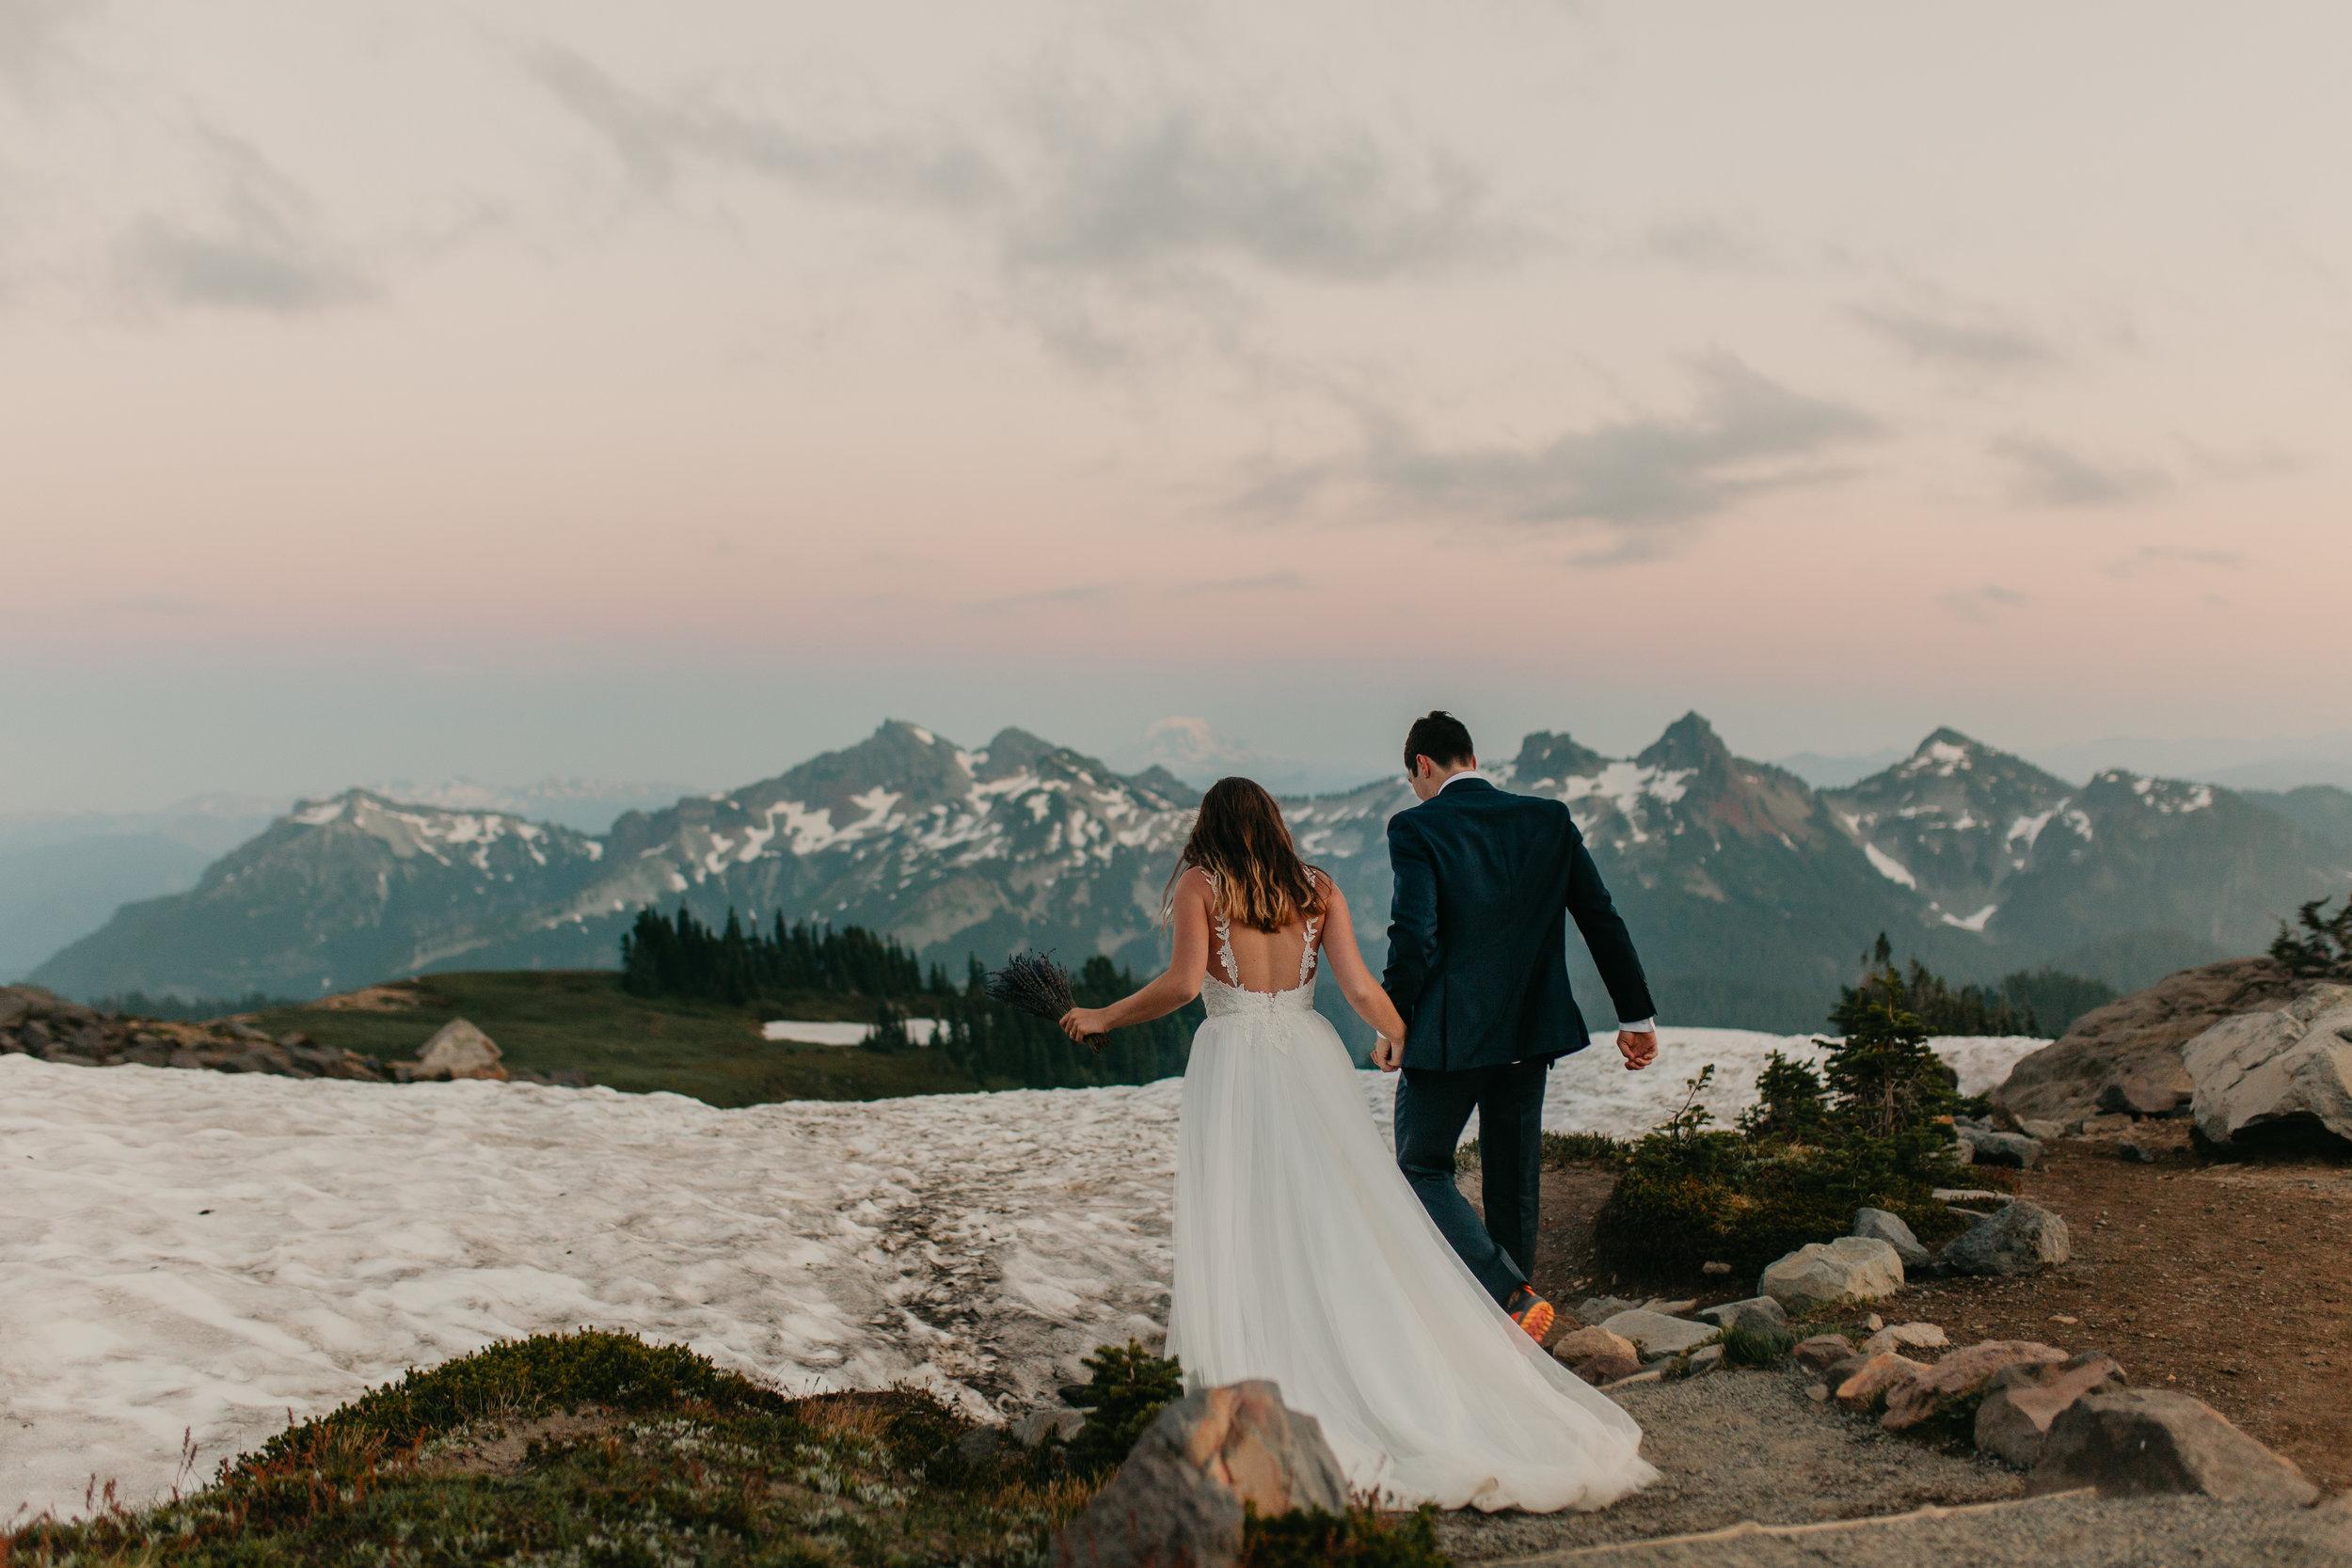 Nicole-Daacke-Photography-Mt-Rainier-elopement-photographer-washington-mountain-epic-wedding-photography-wildflowers-at-rainier-pine-tree-cloudy-summer-day-at-mountain-rainier-73.jpg